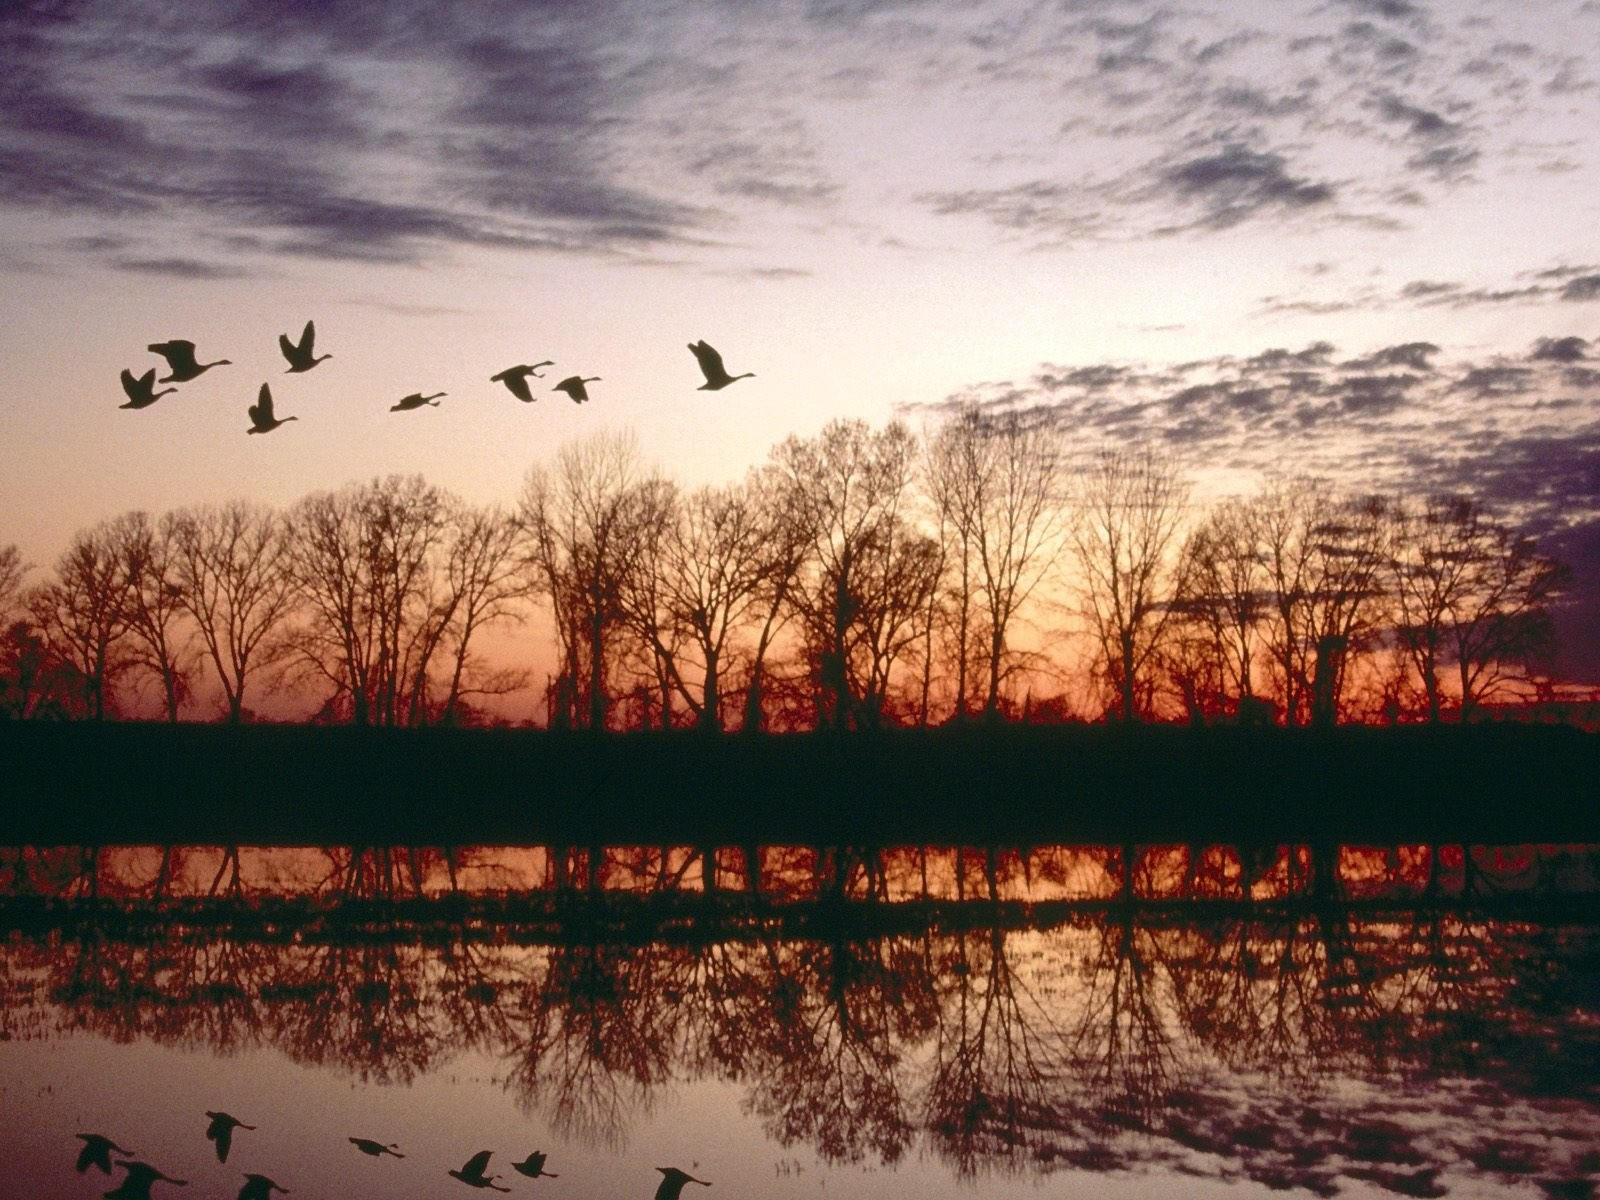 картинки птиц улетающих